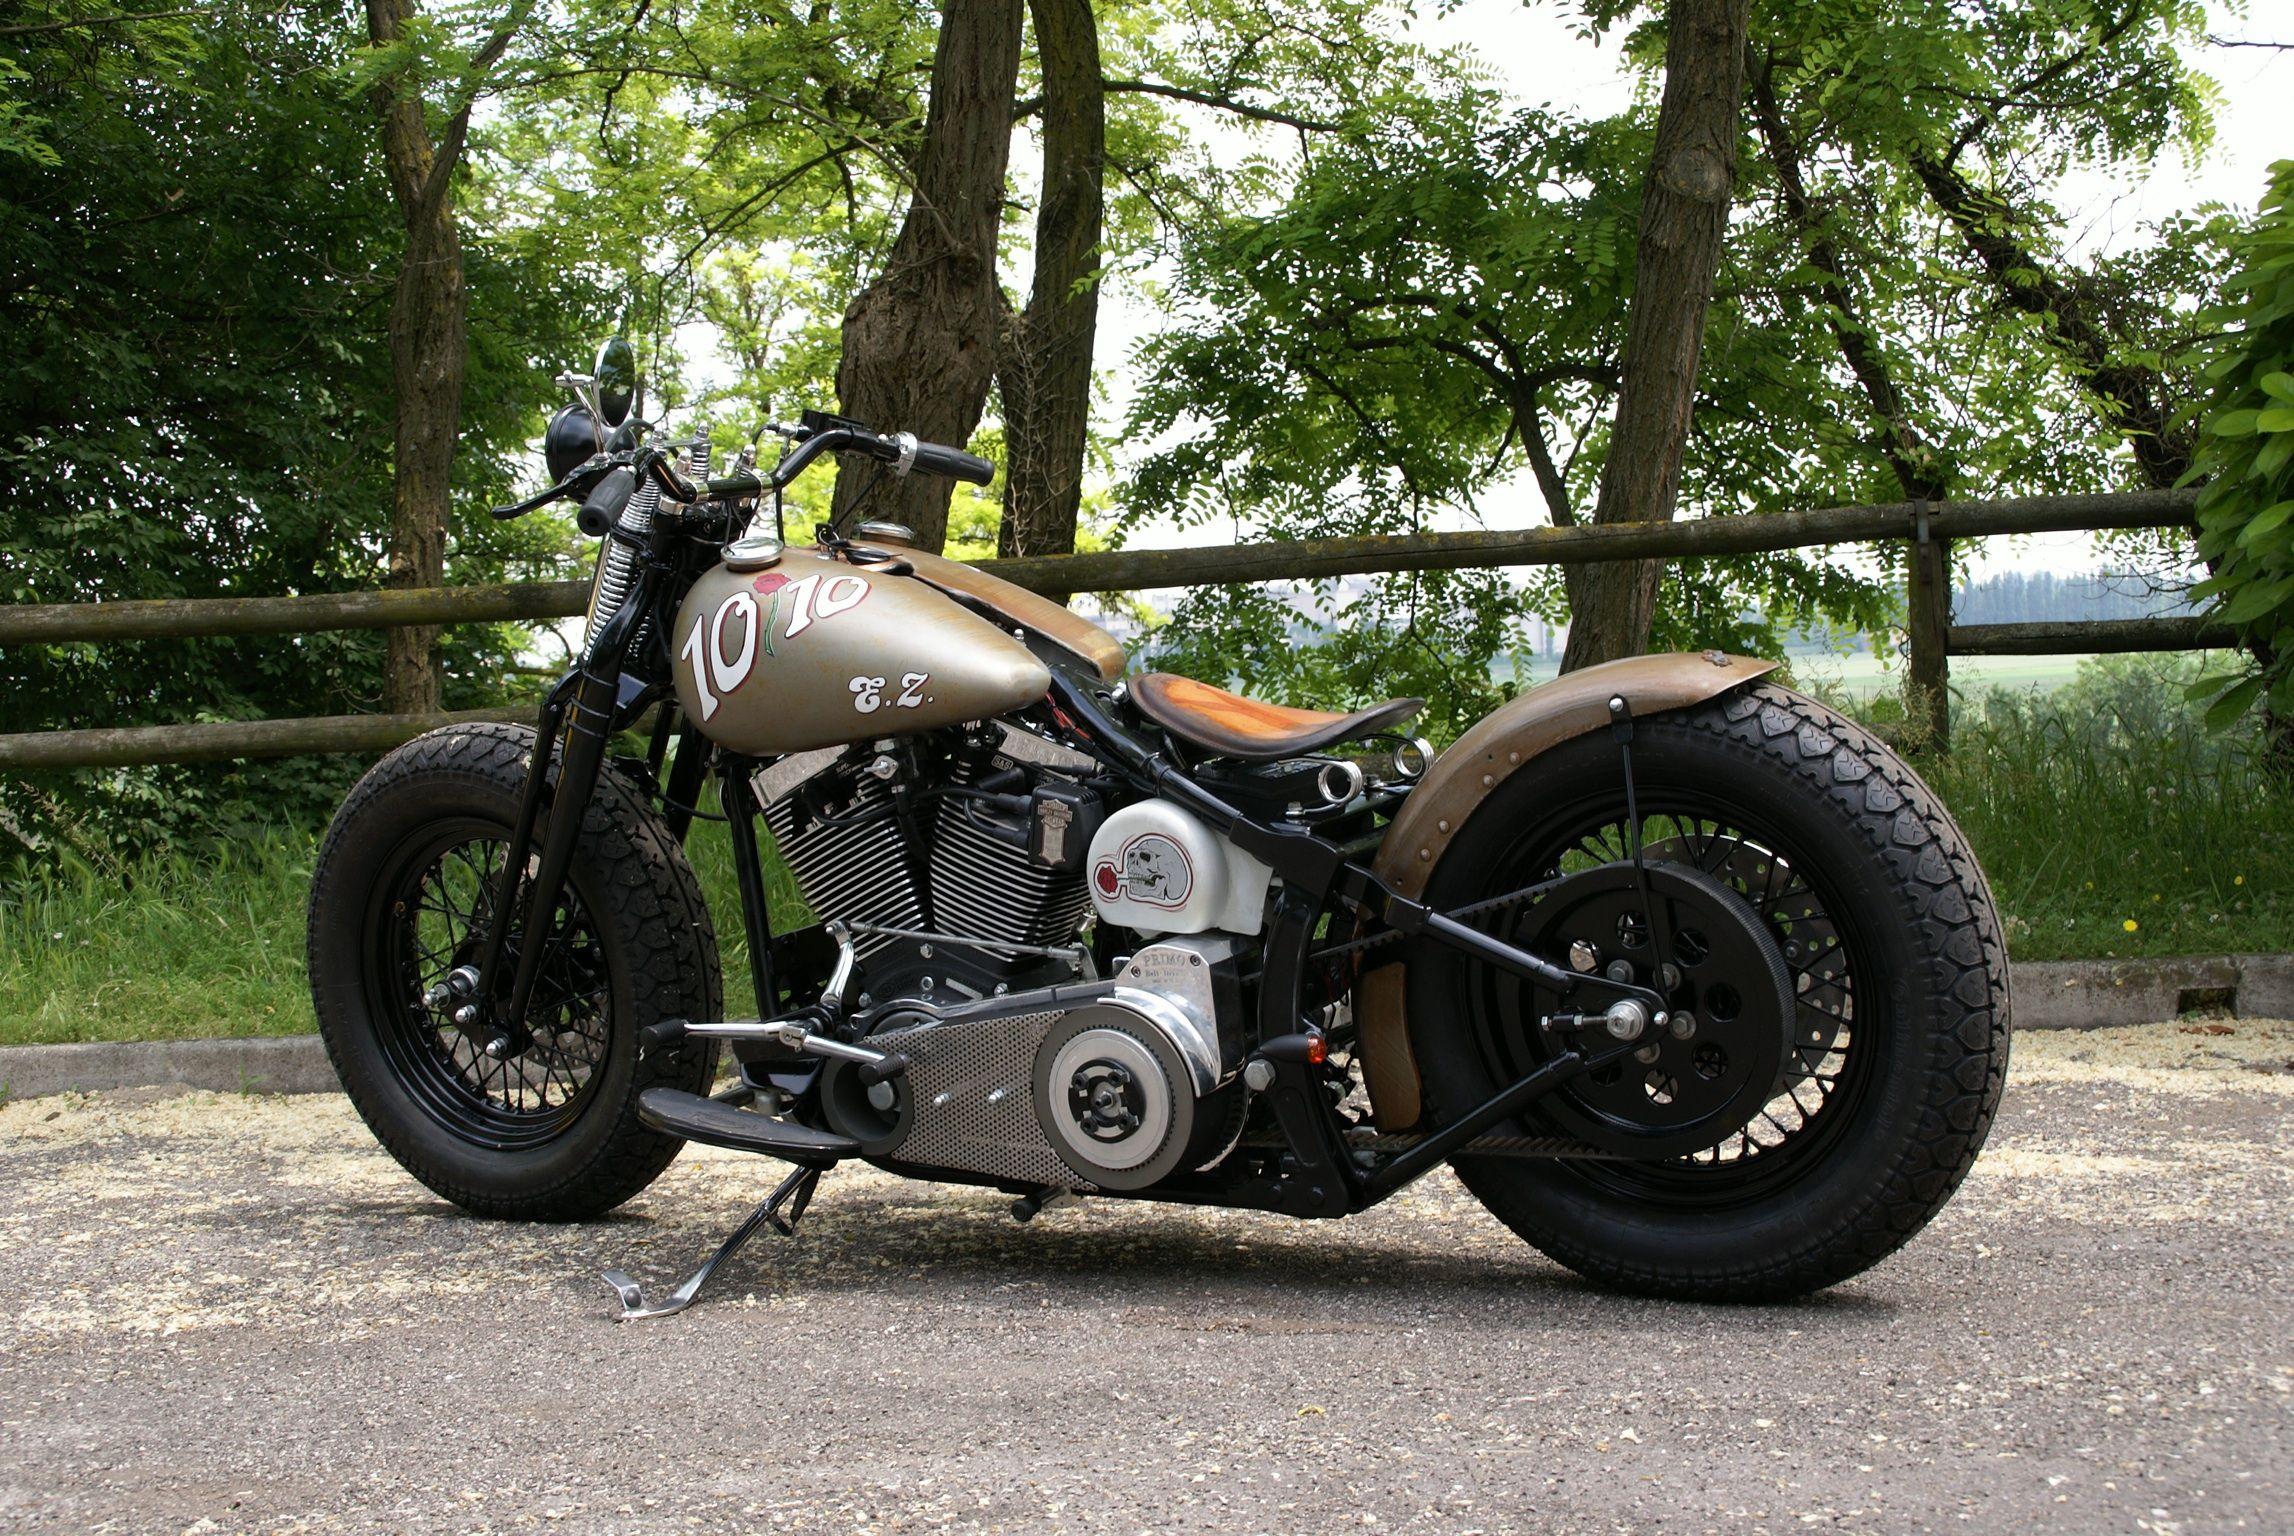 I love those stripped bikes.